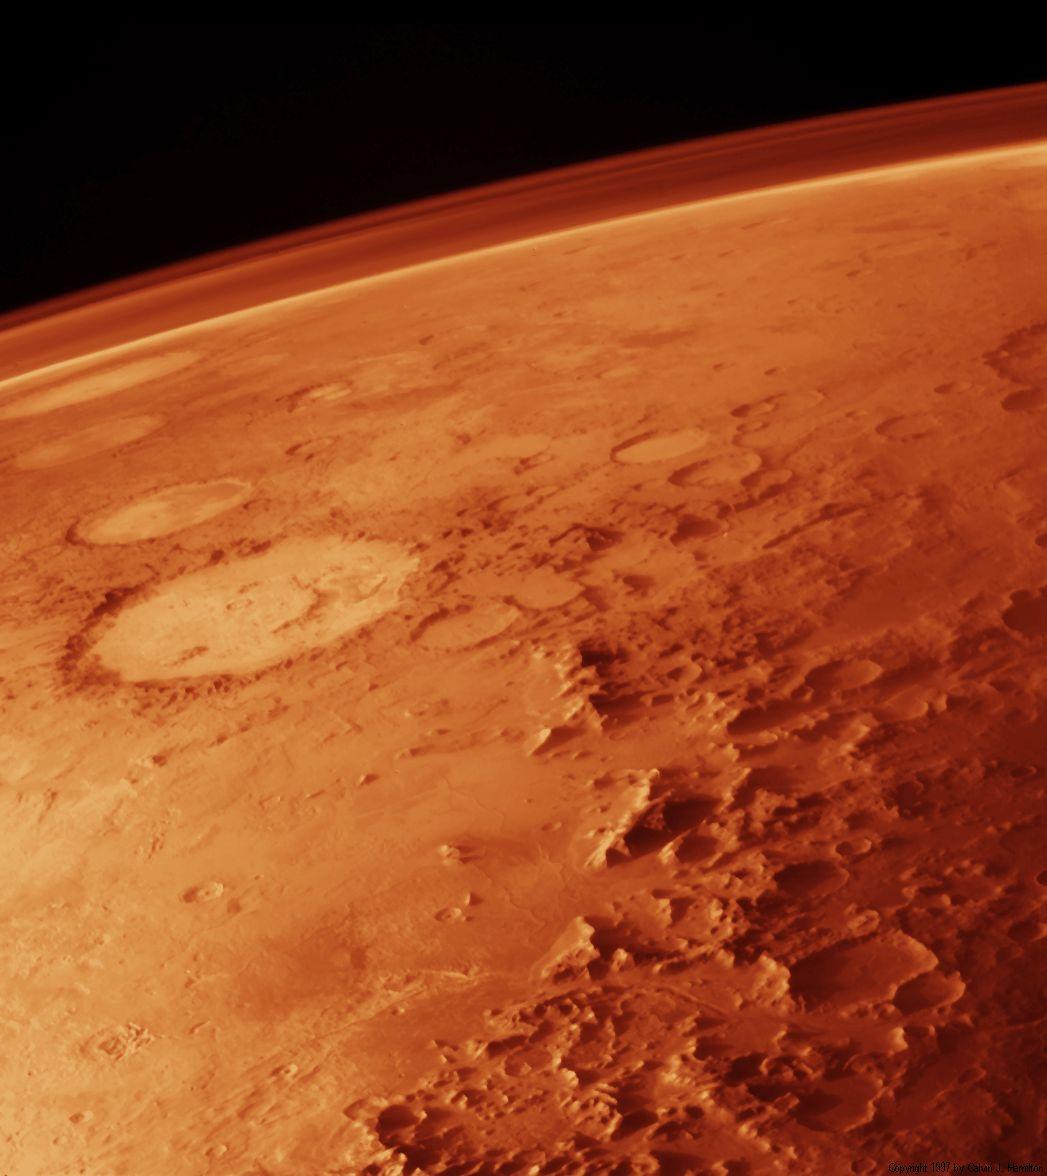 Mars | The Refined Geek